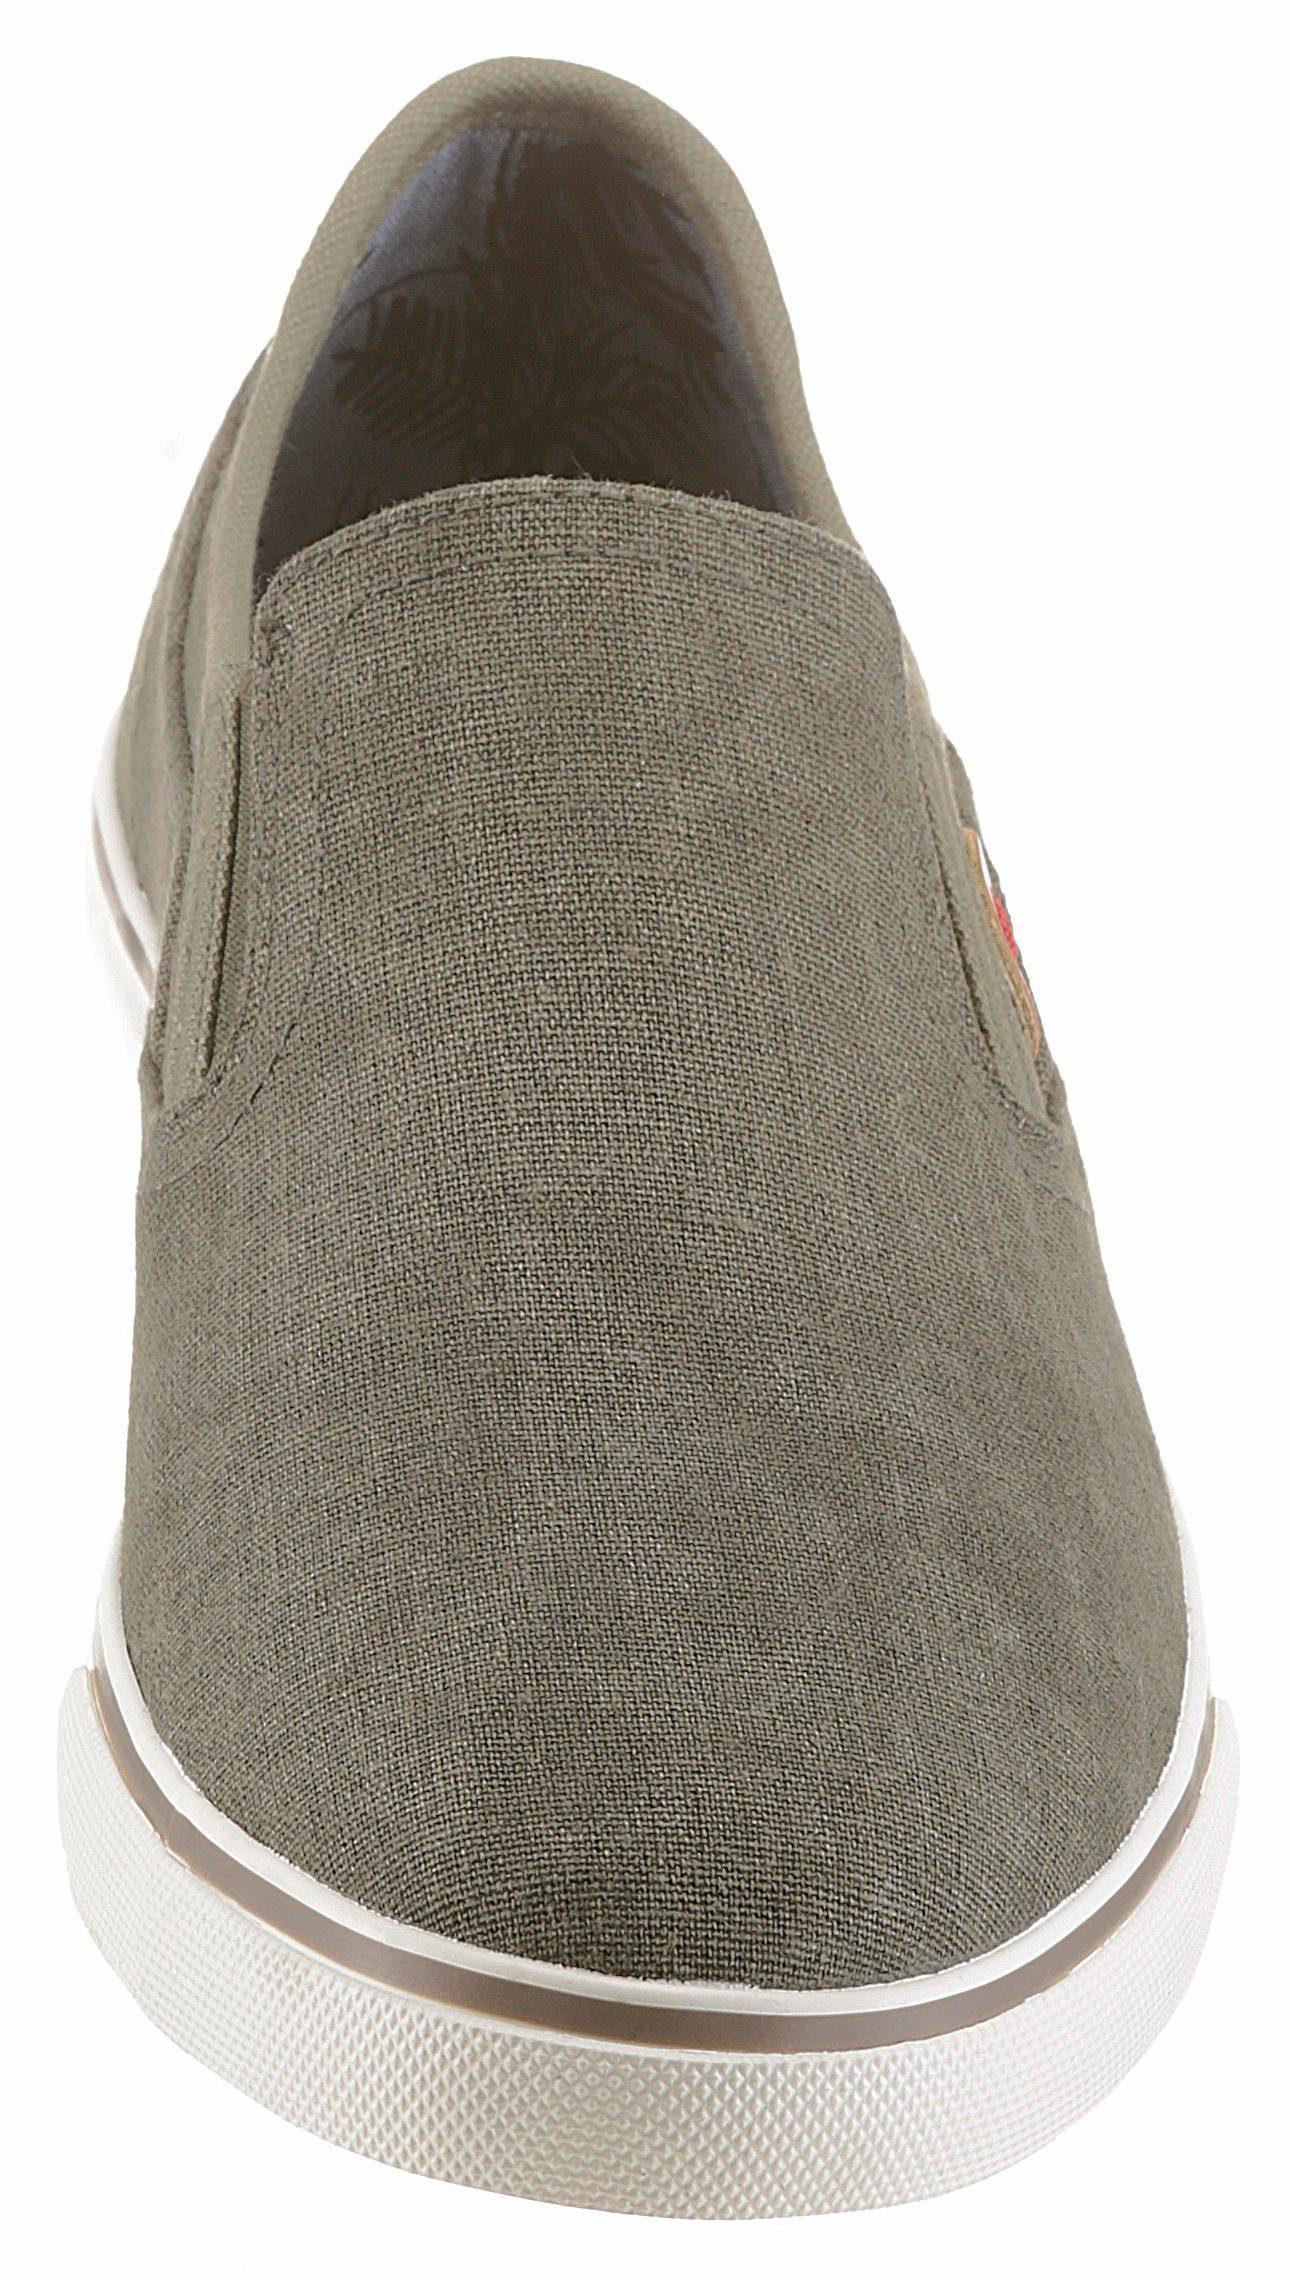 On nr 8490694483 Sneaker Artikel Zum Schlupfen Wrangler Mitos Khaki Slip wq6x8ap0E